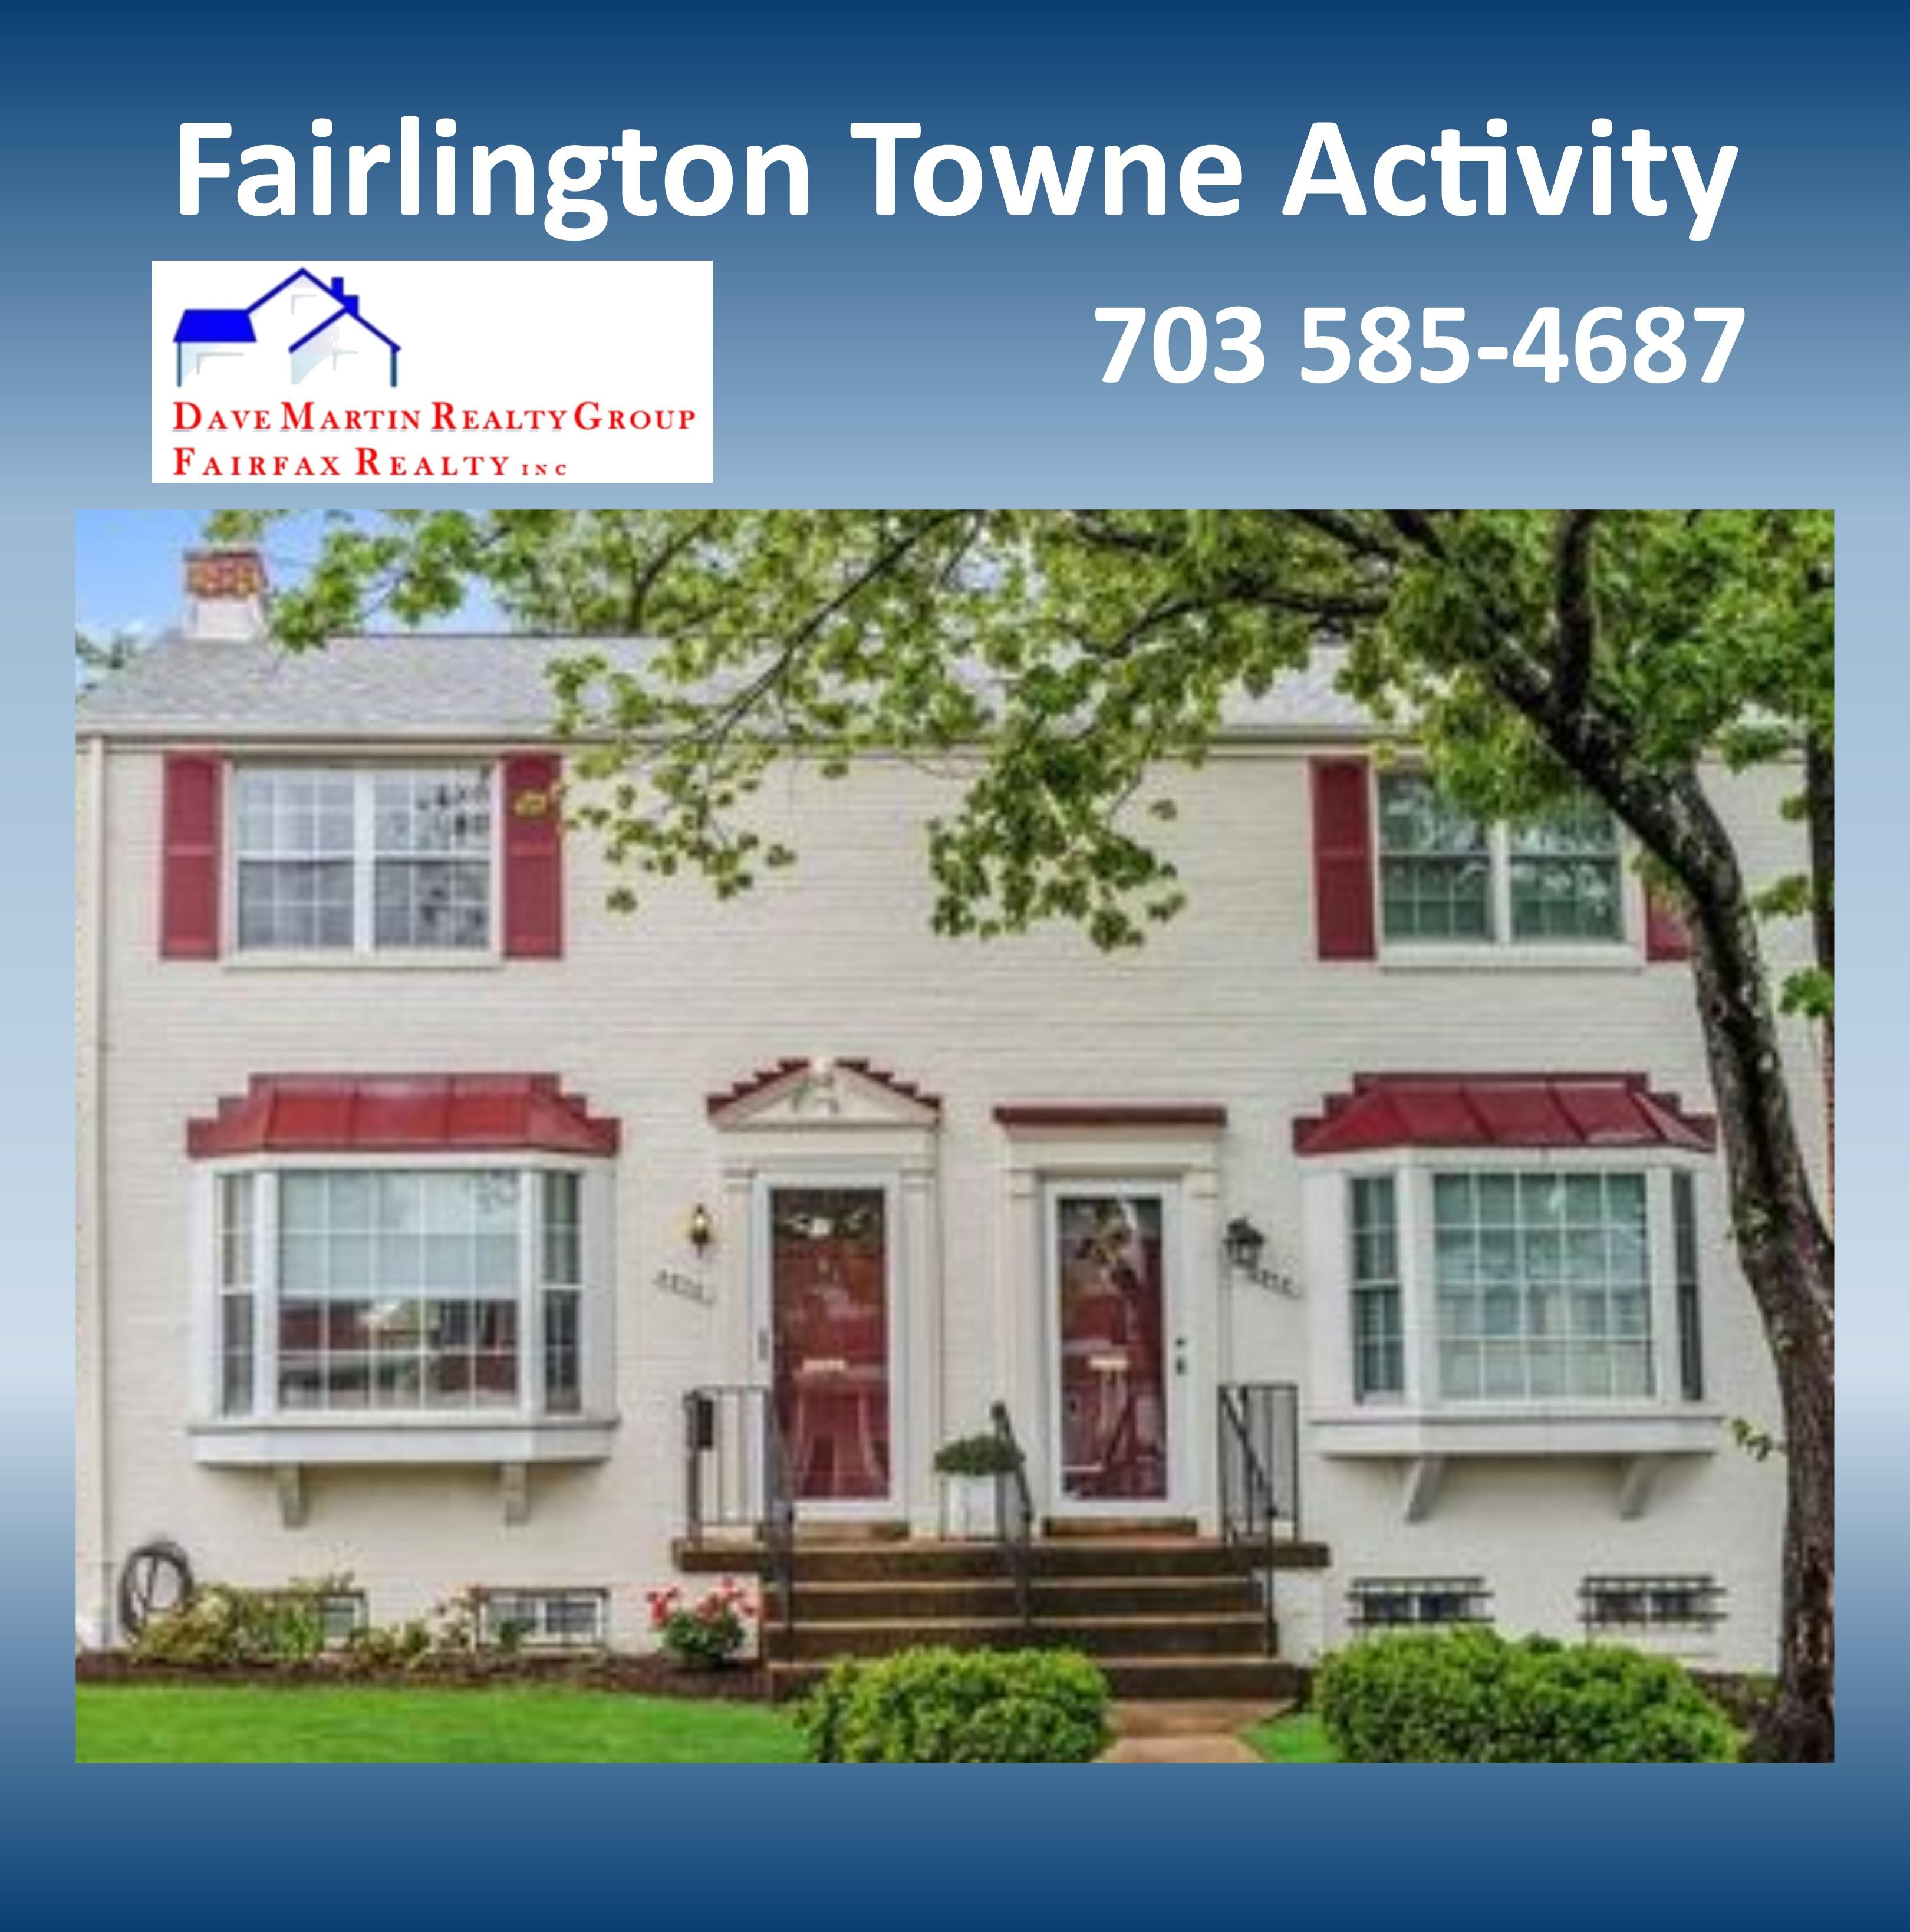 Fairlington Towne Homes Townhouses Alexandria, Va 22302